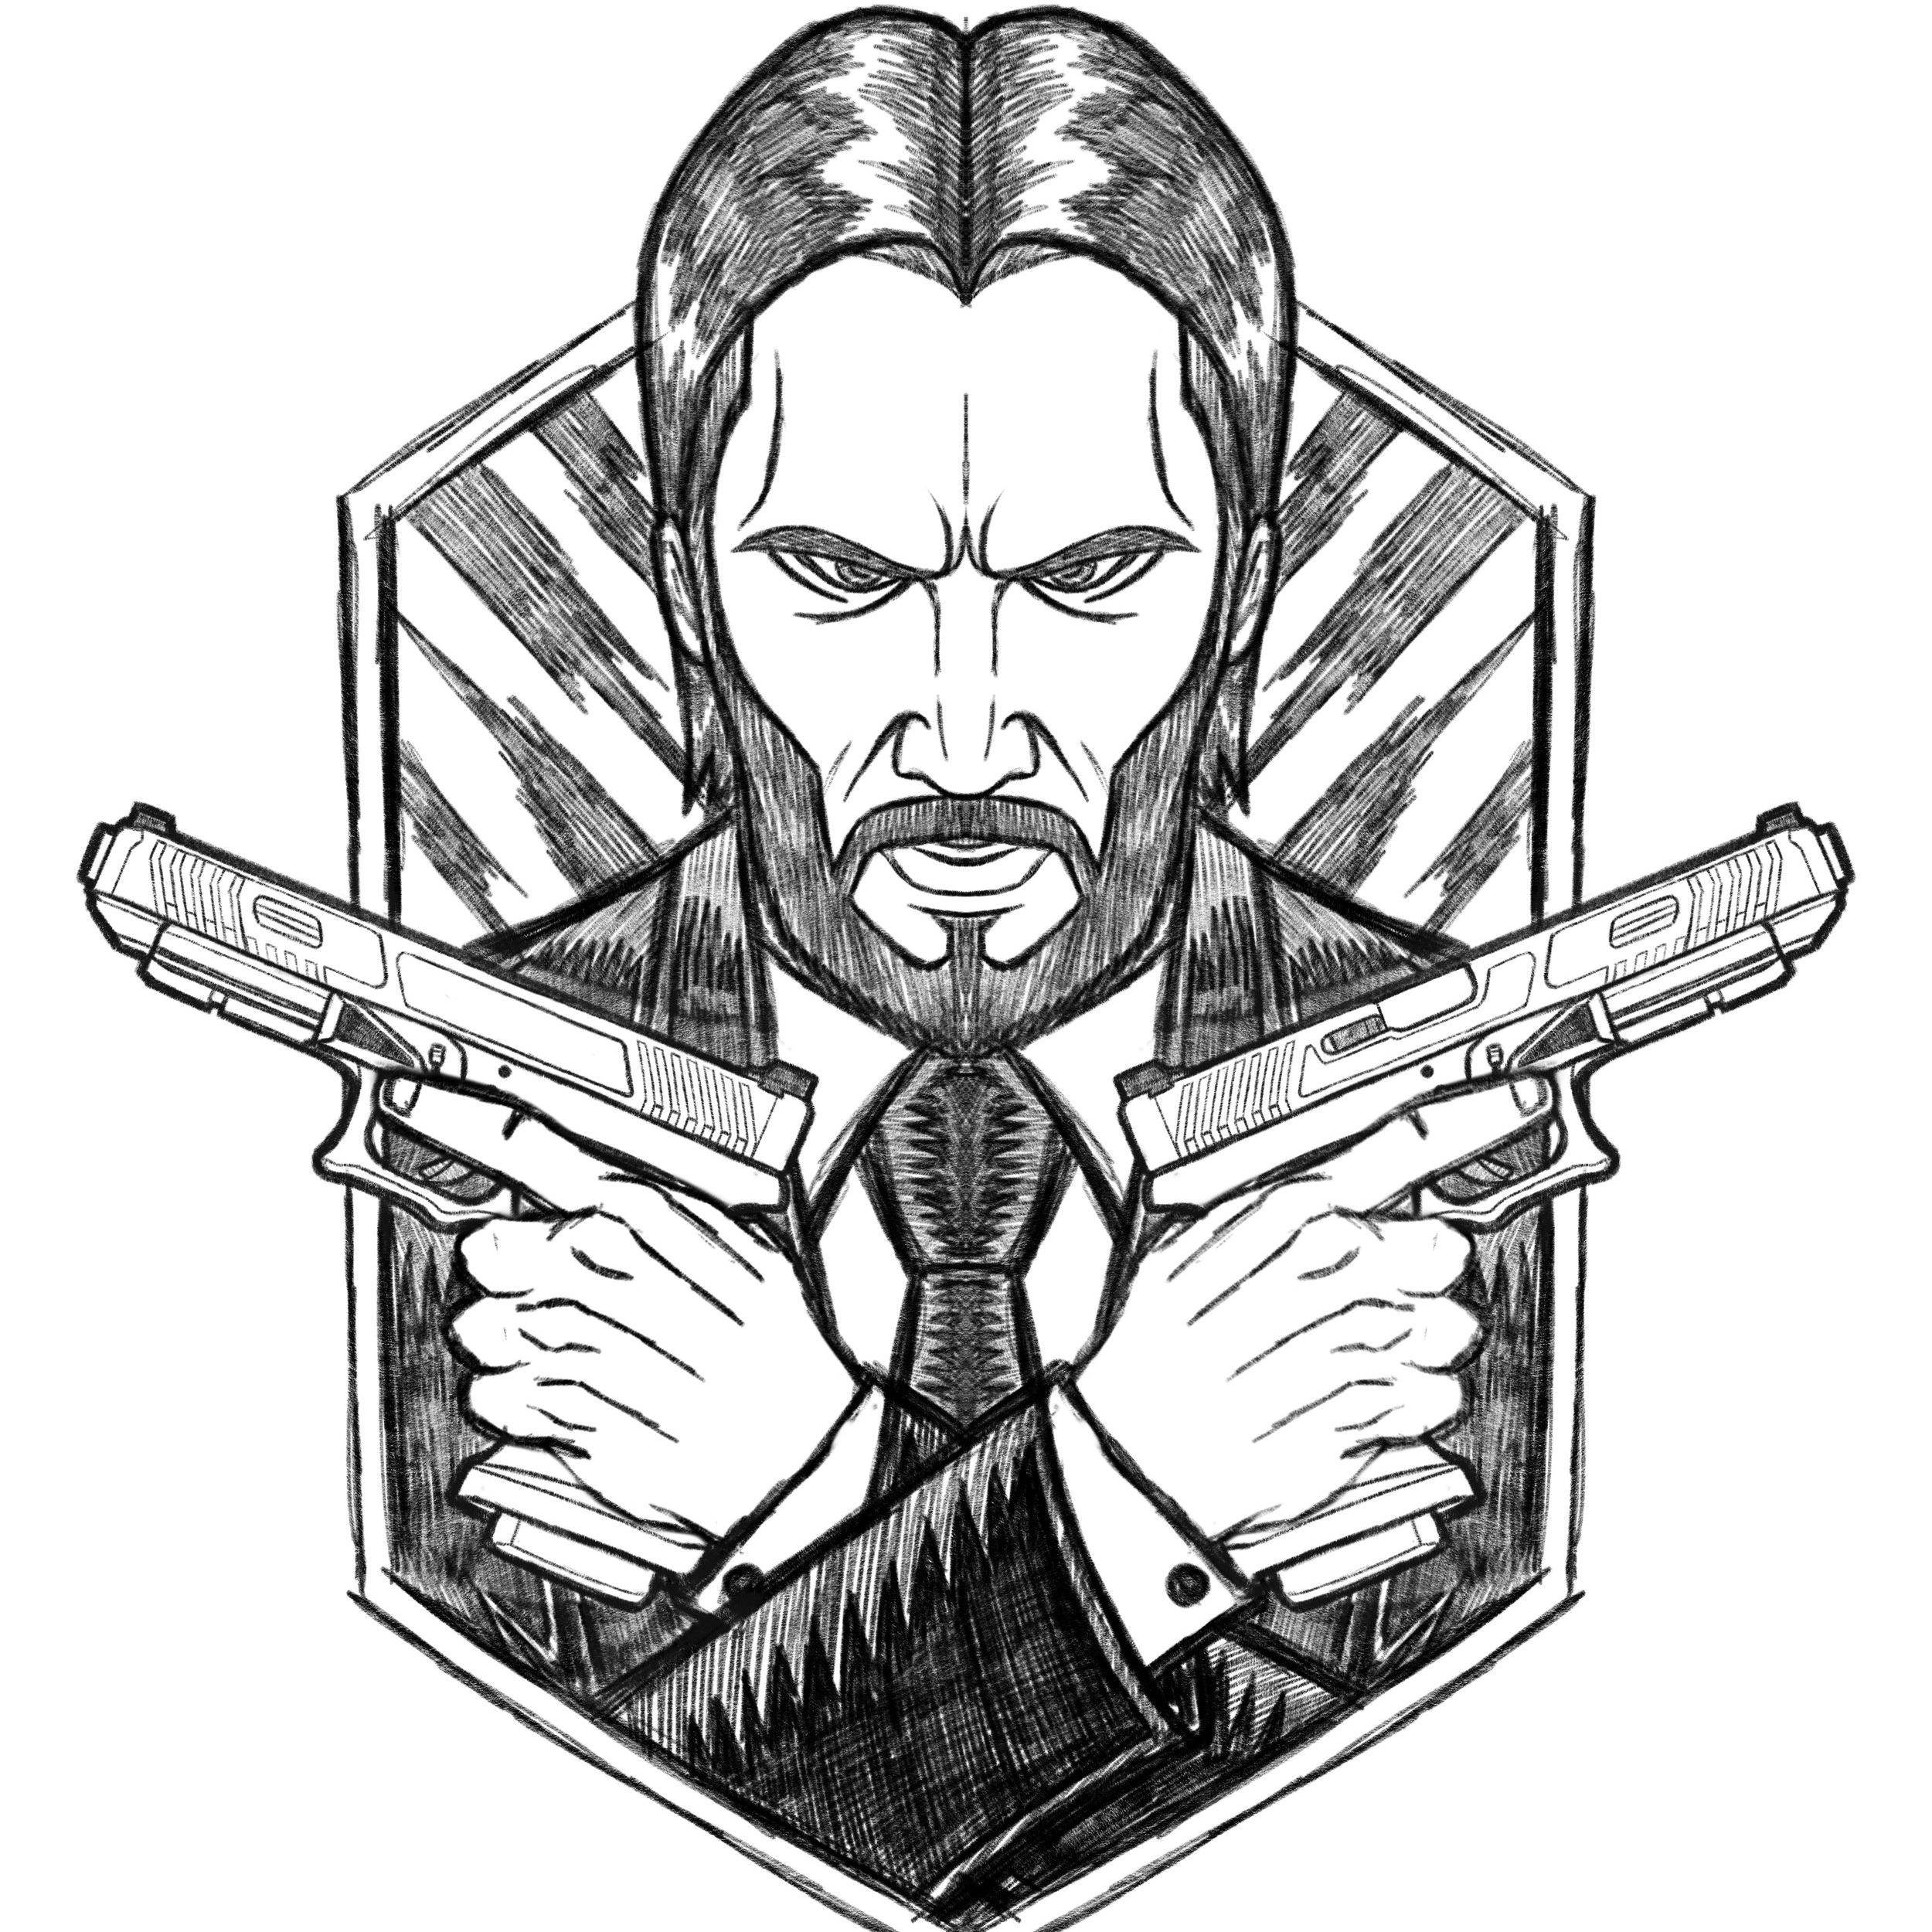 Defcon-Propaganda-john-wick-patch-orozcodesign-robertoorozco-illustration-johnwick-vector-poster-design-pencil.JPG